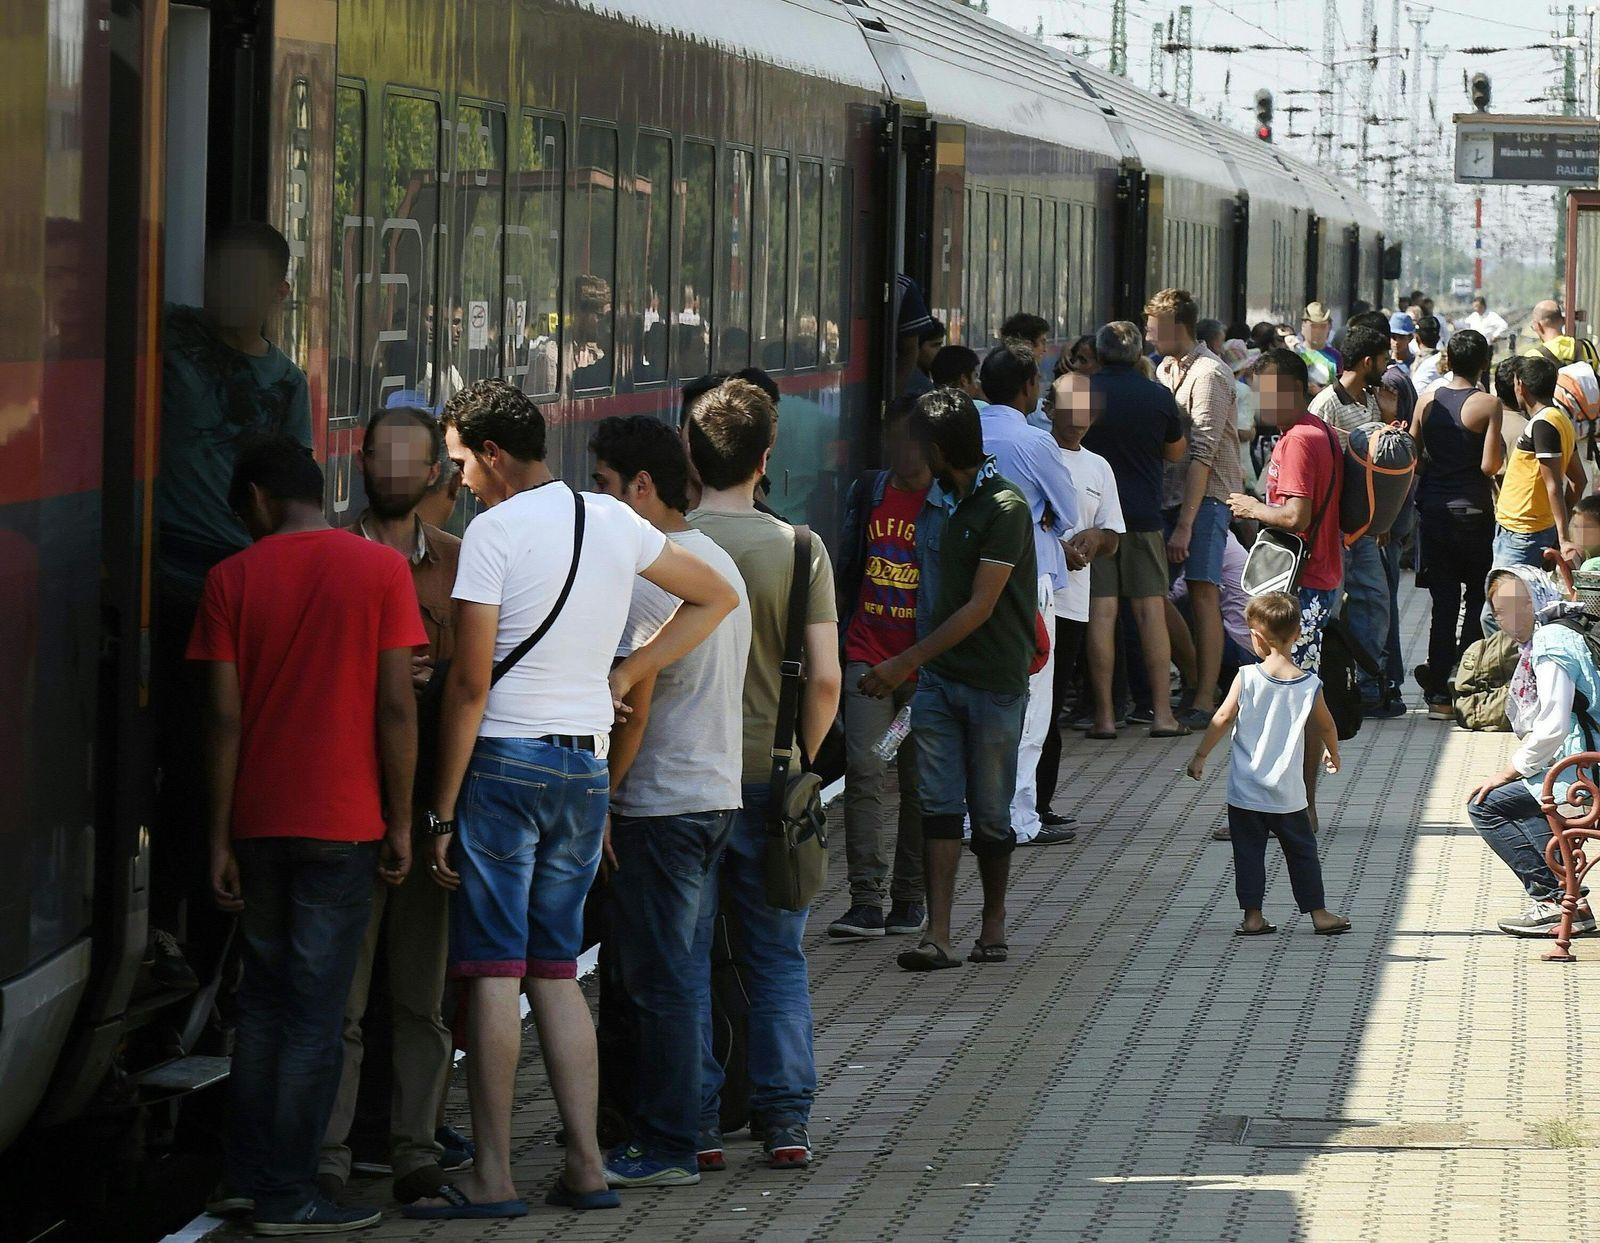 Migrants on the platform of the railway station in Hegyeshalom